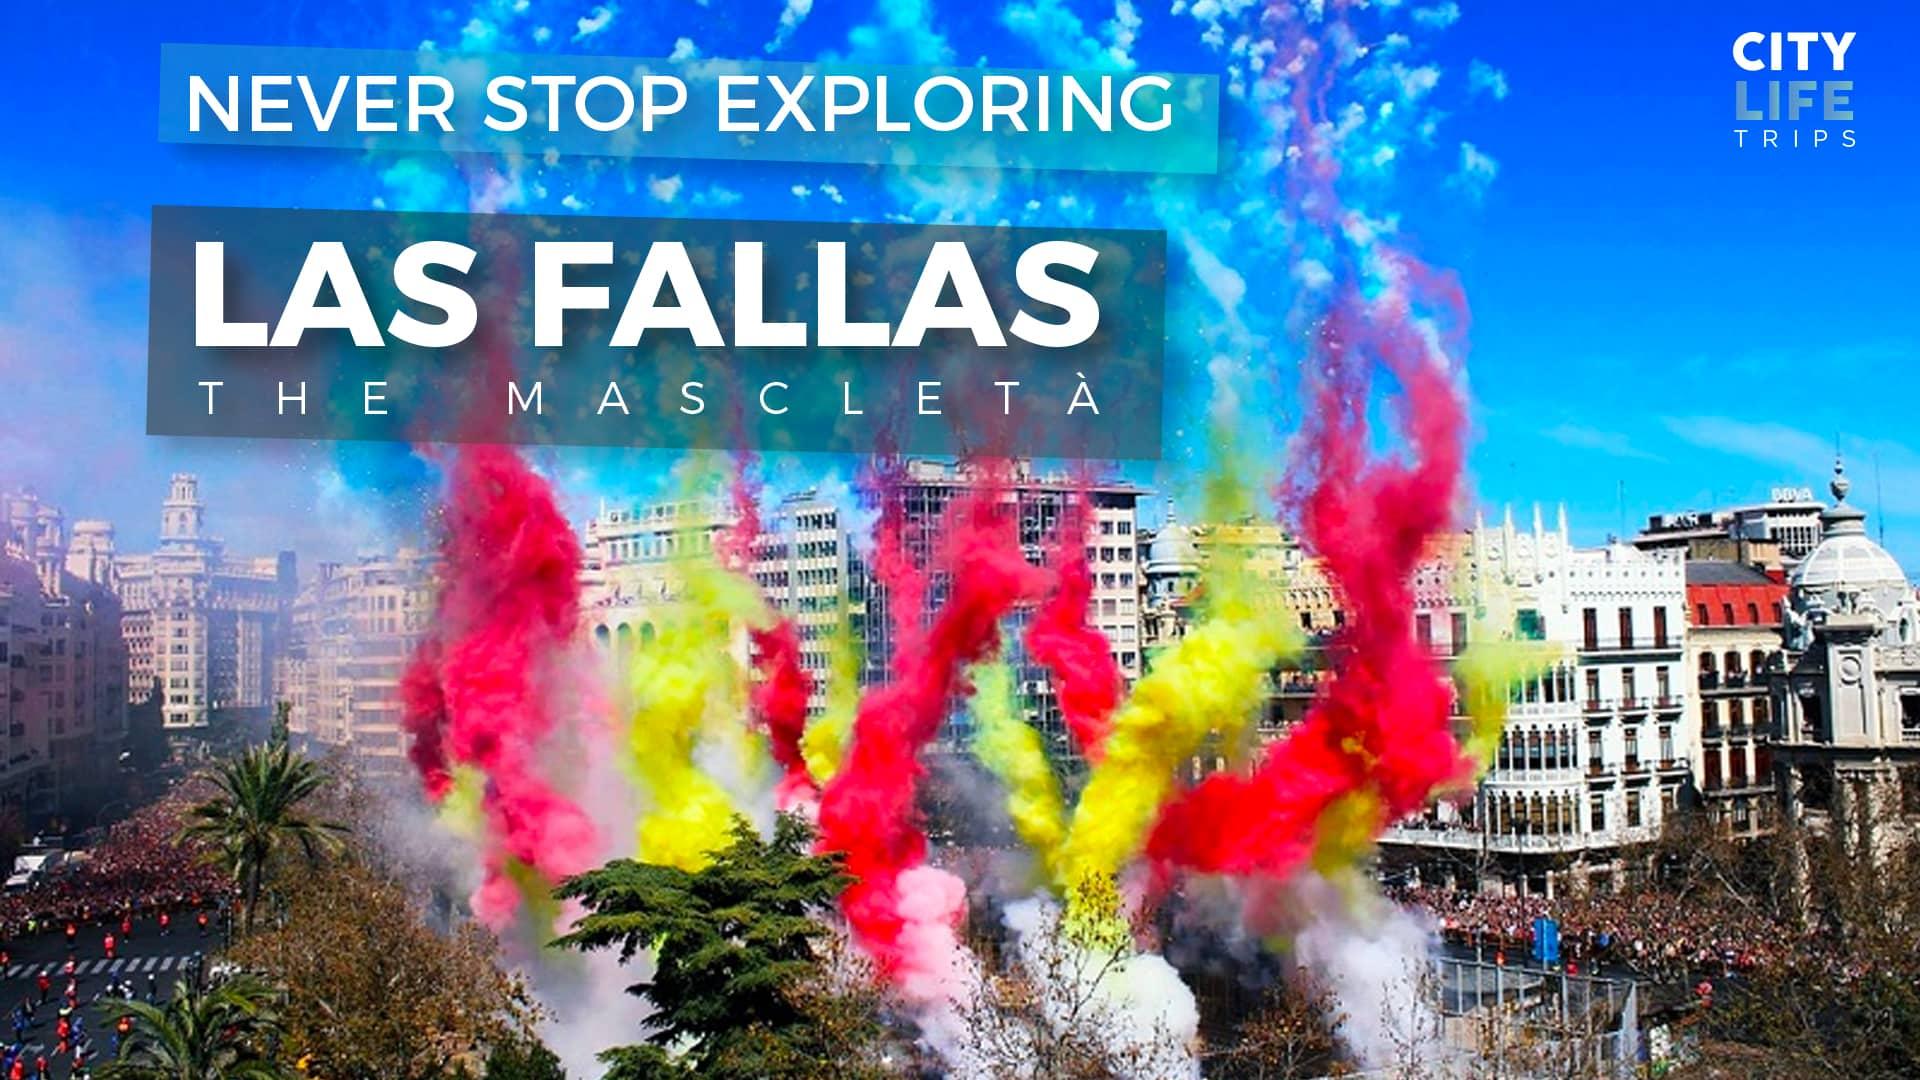 Las Fallas #1 – The Mascletá at the Fallas Festival